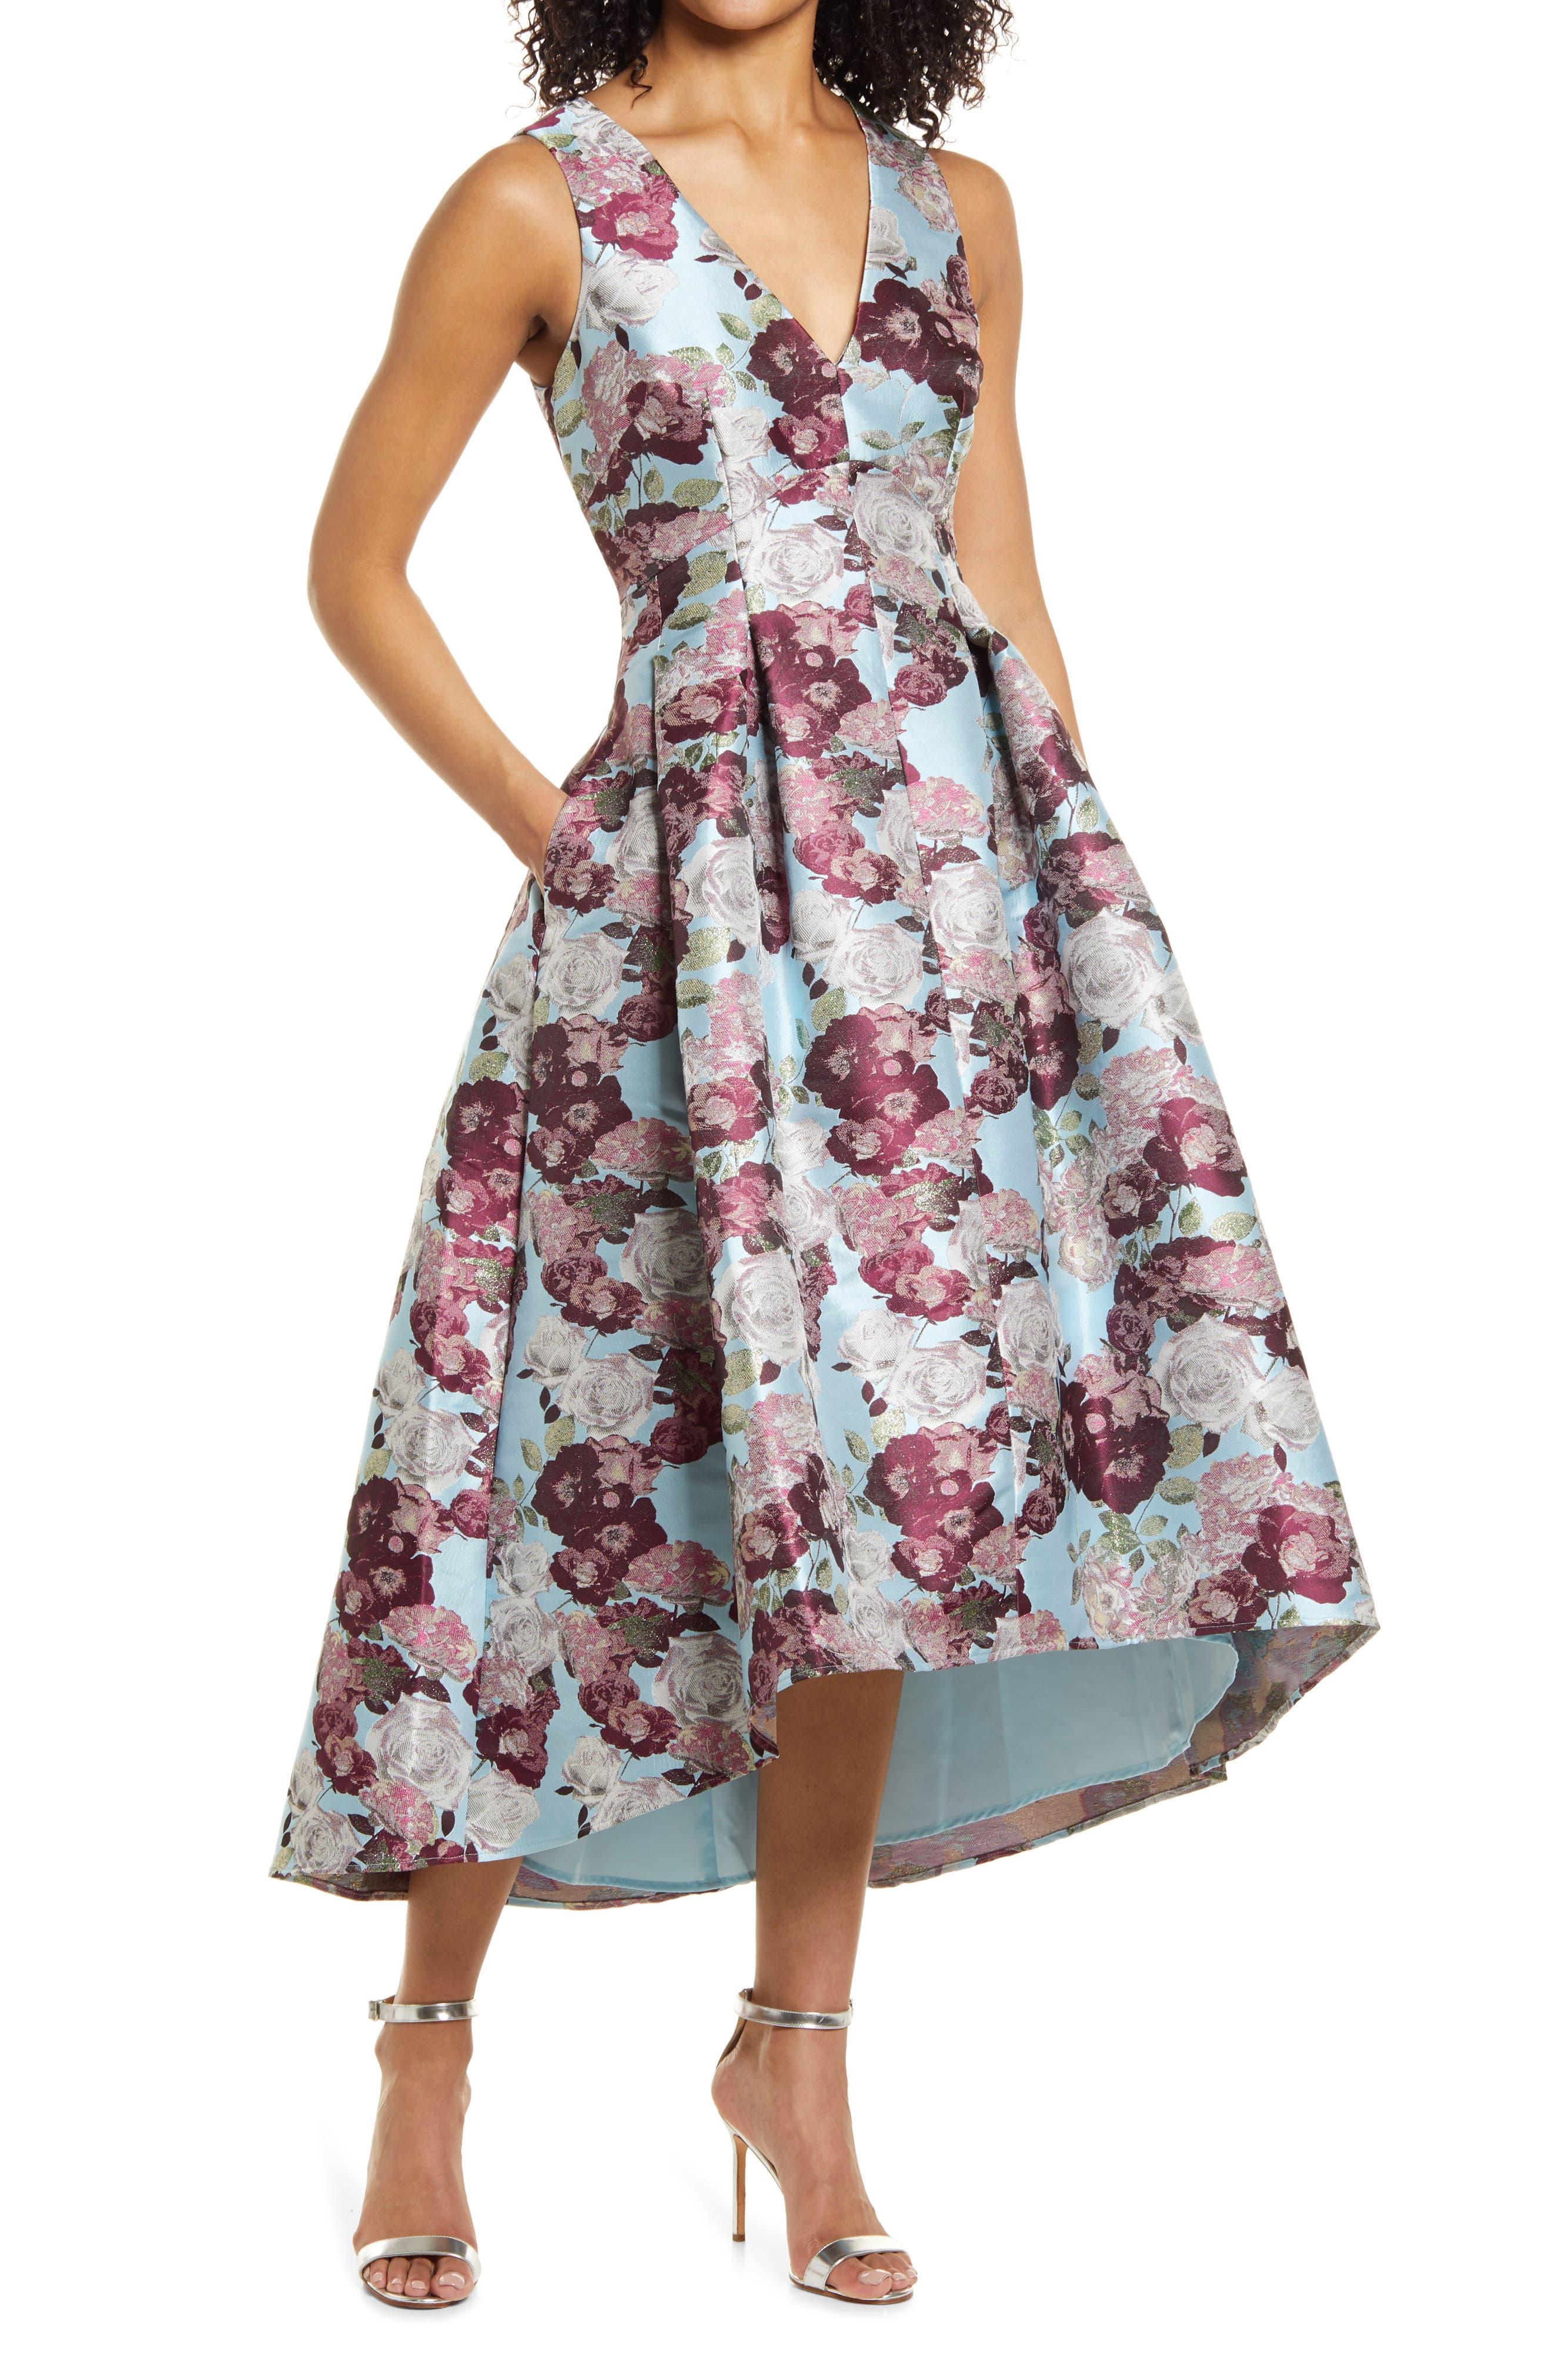 Metallic Floral Jacquard Cocktail Dress